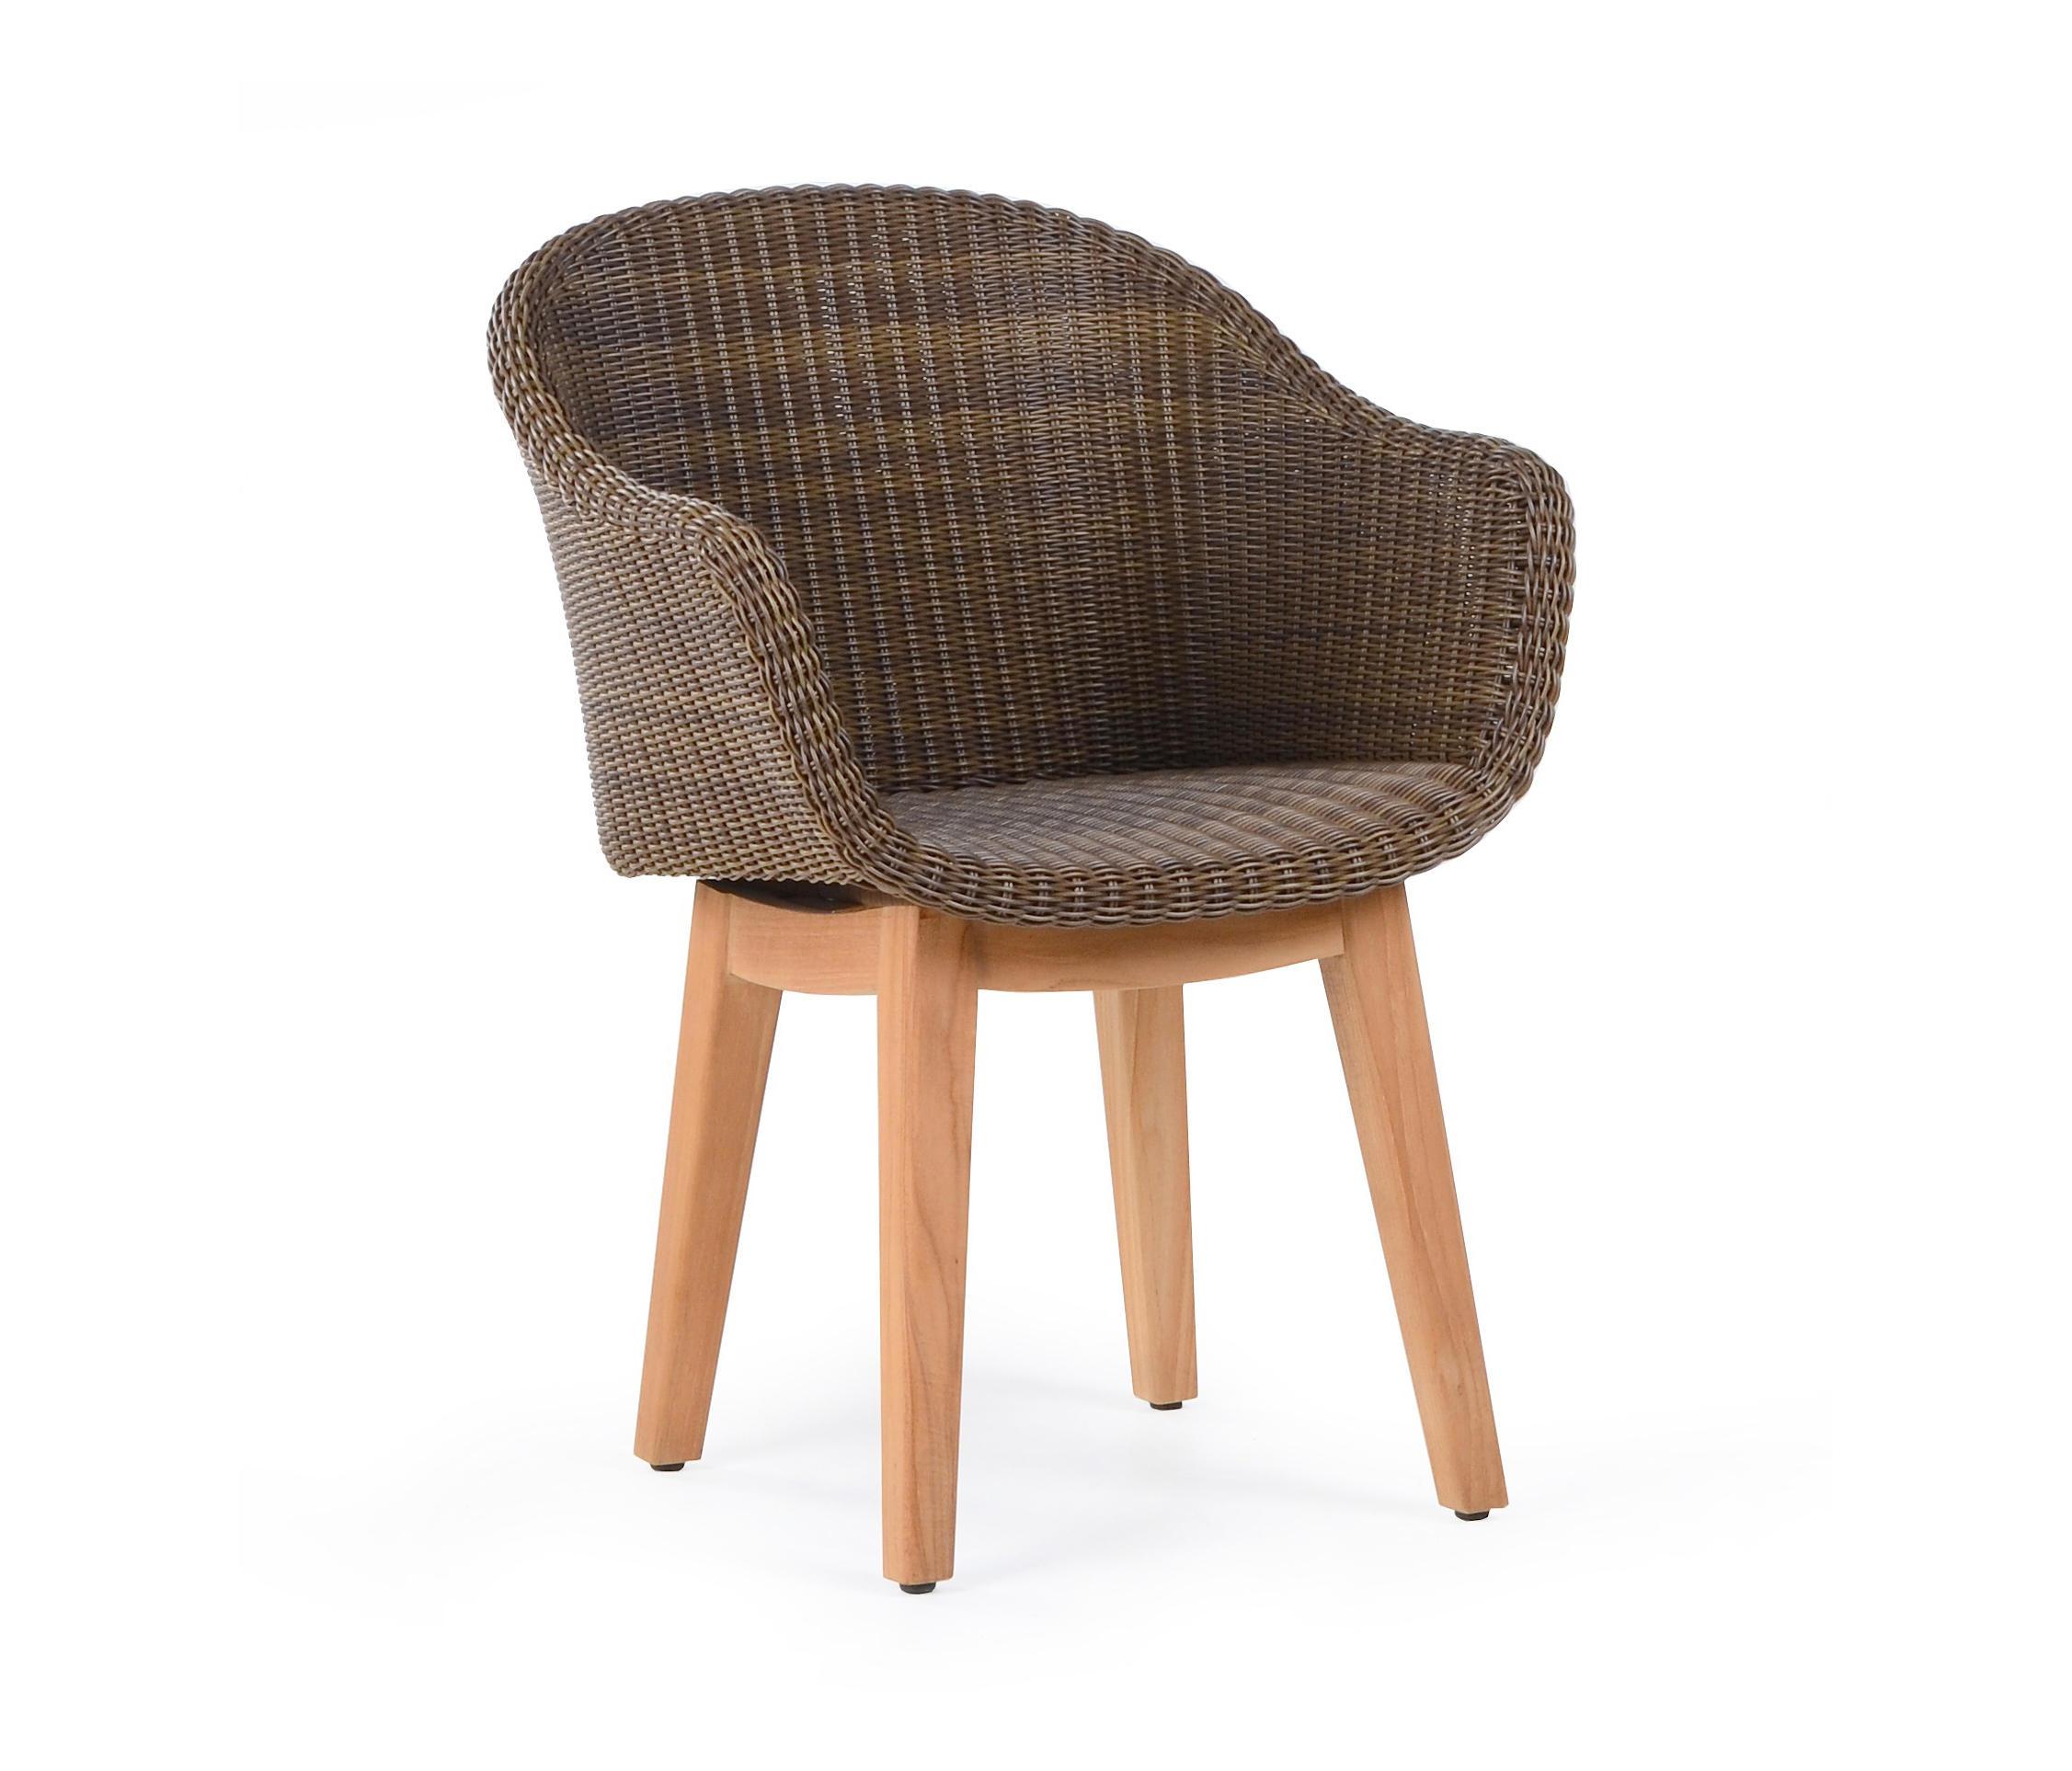 MATZ ARMCHAIR - Garden chairs from Wintons Teak   Architonic